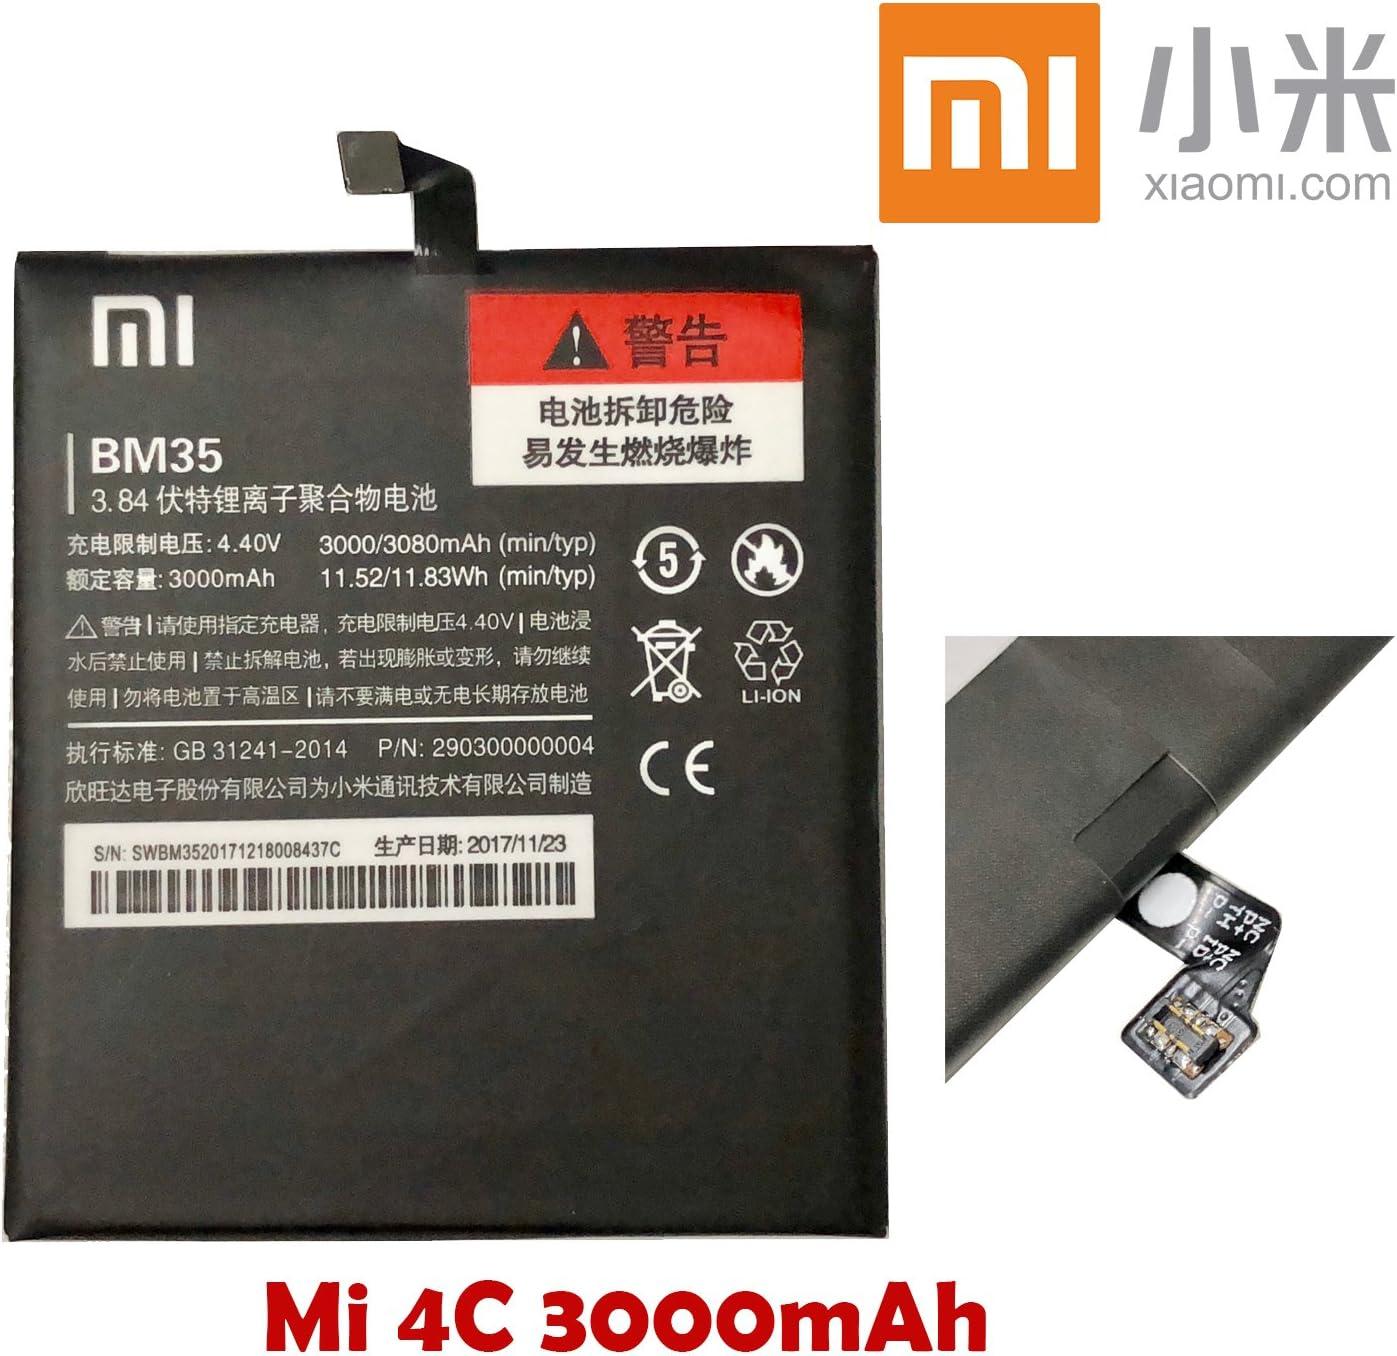 Batería Xiaomi BM35BM 353000mAh Original para Xiaomi Mi4C Mi 4C (unidades Bulk